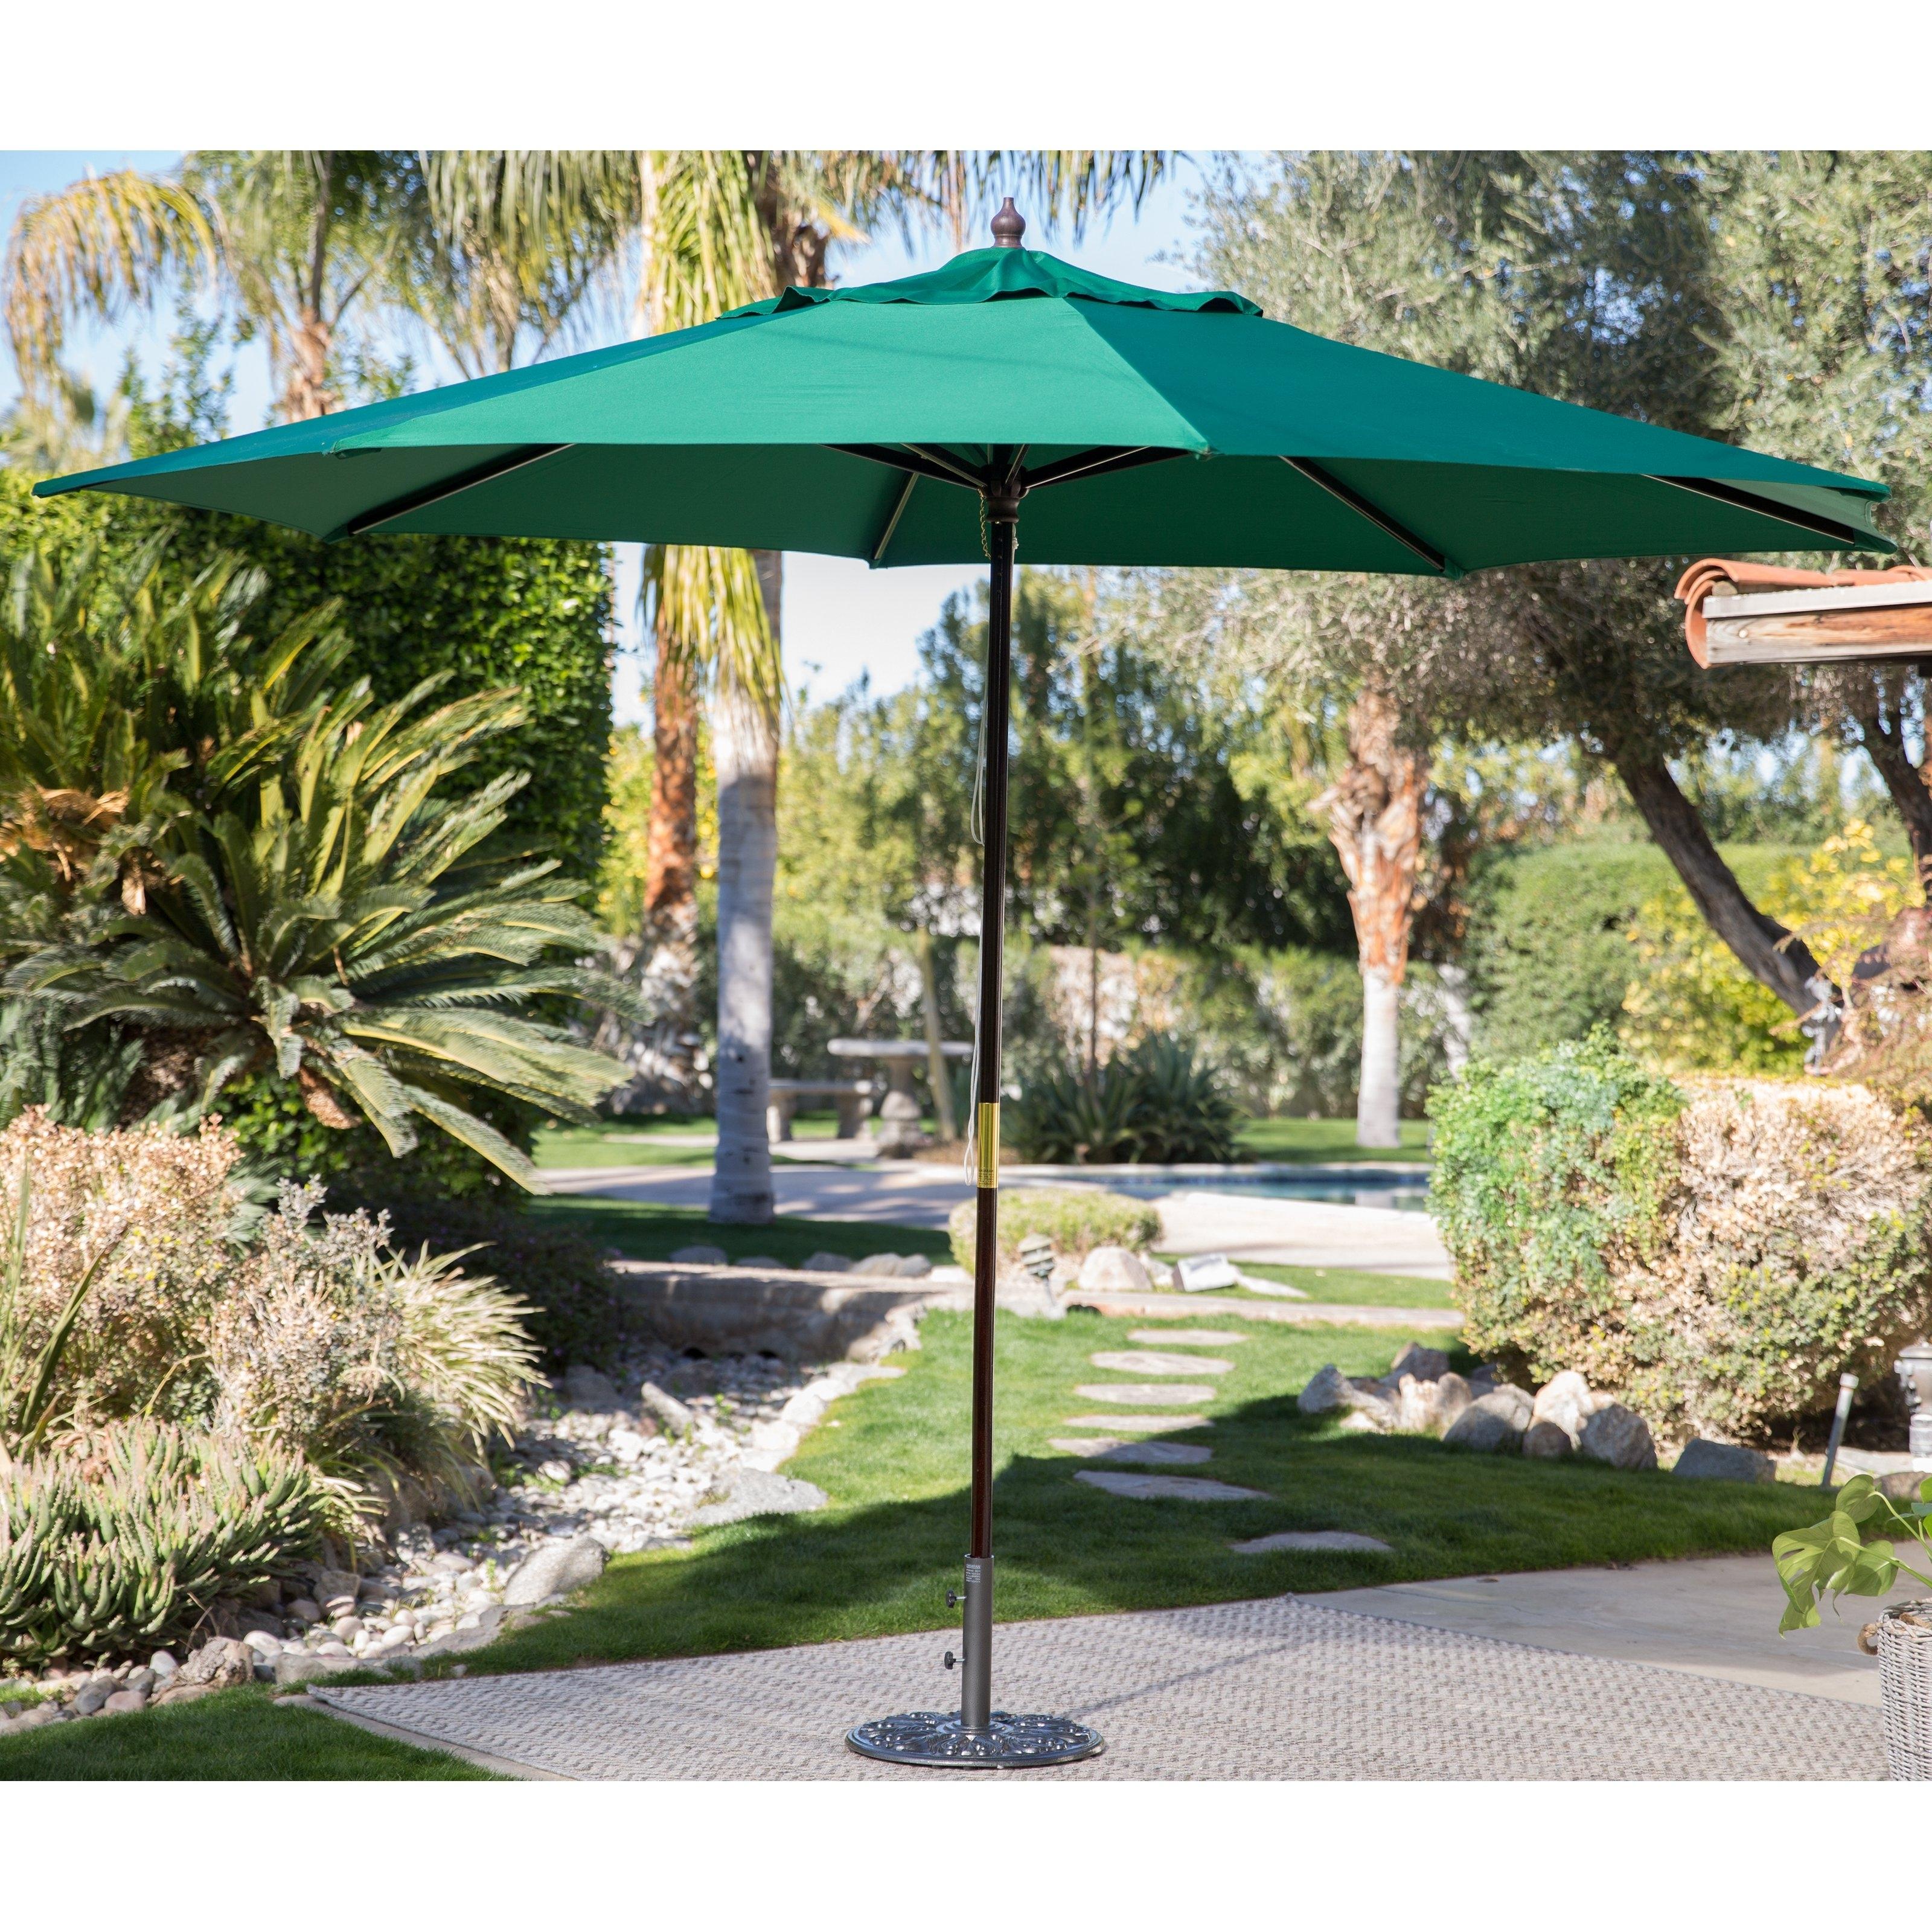 Current Shapely Cantilever Umbrella Stand Umbrella Bases Patio Umbrella Throughout Half Patio Umbrellas (View 4 of 20)